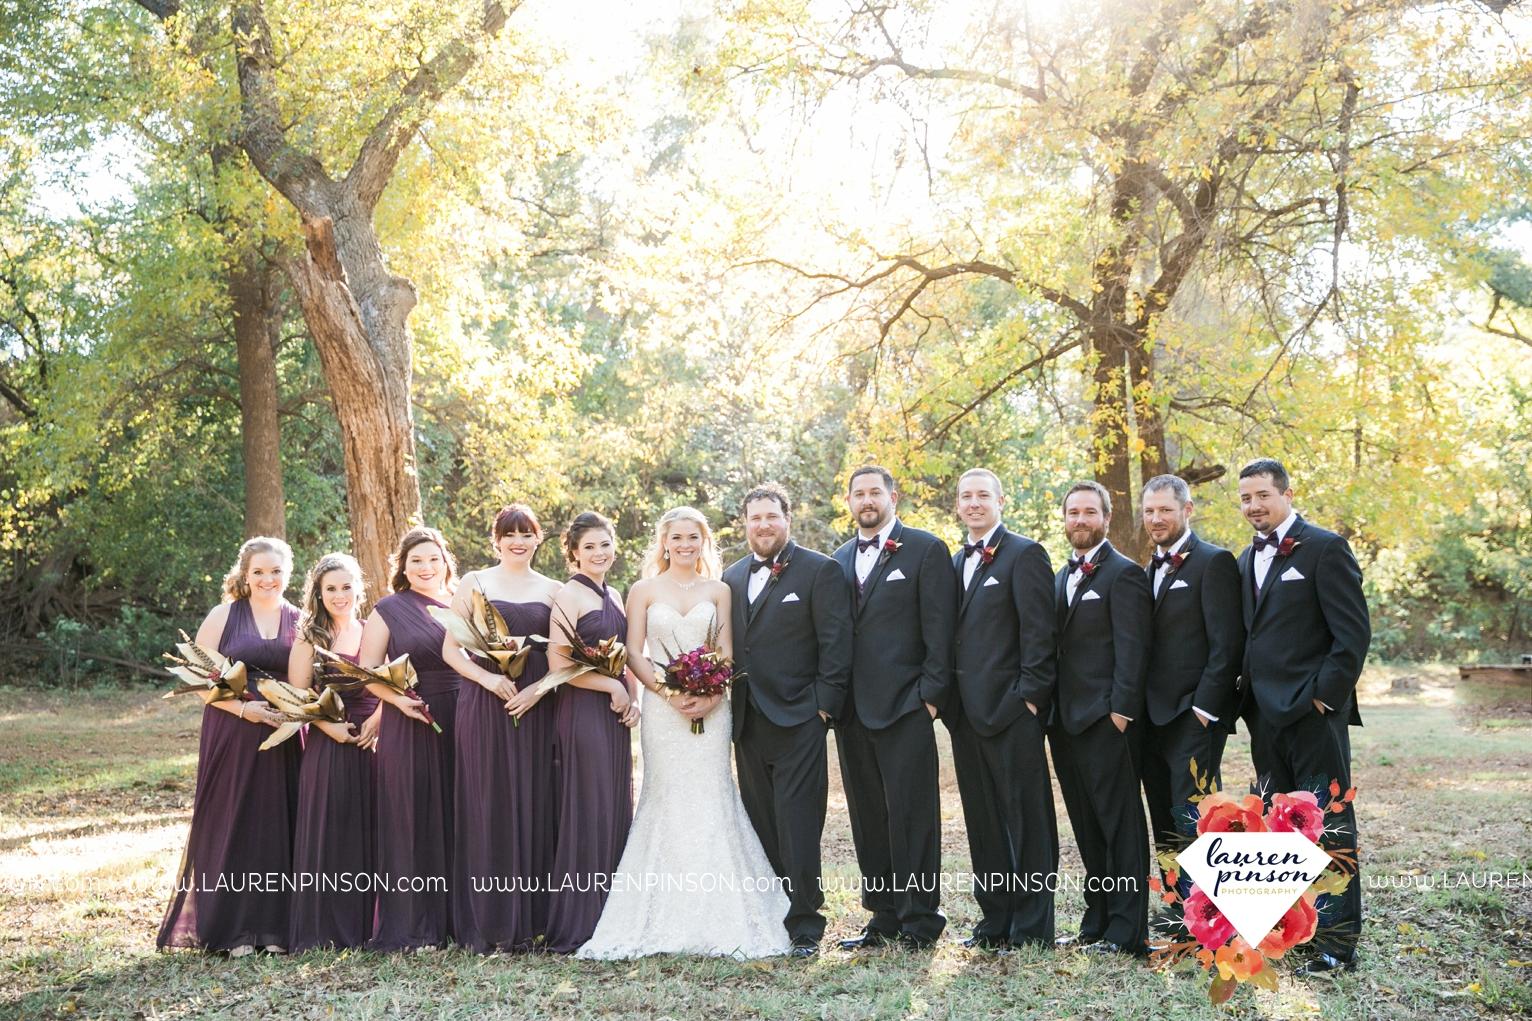 rustic-wichita-falls-texas-wedding-photographer-gold-glam-mayfield-events-market-street-united-allue-bridals-fall_1749.jpg